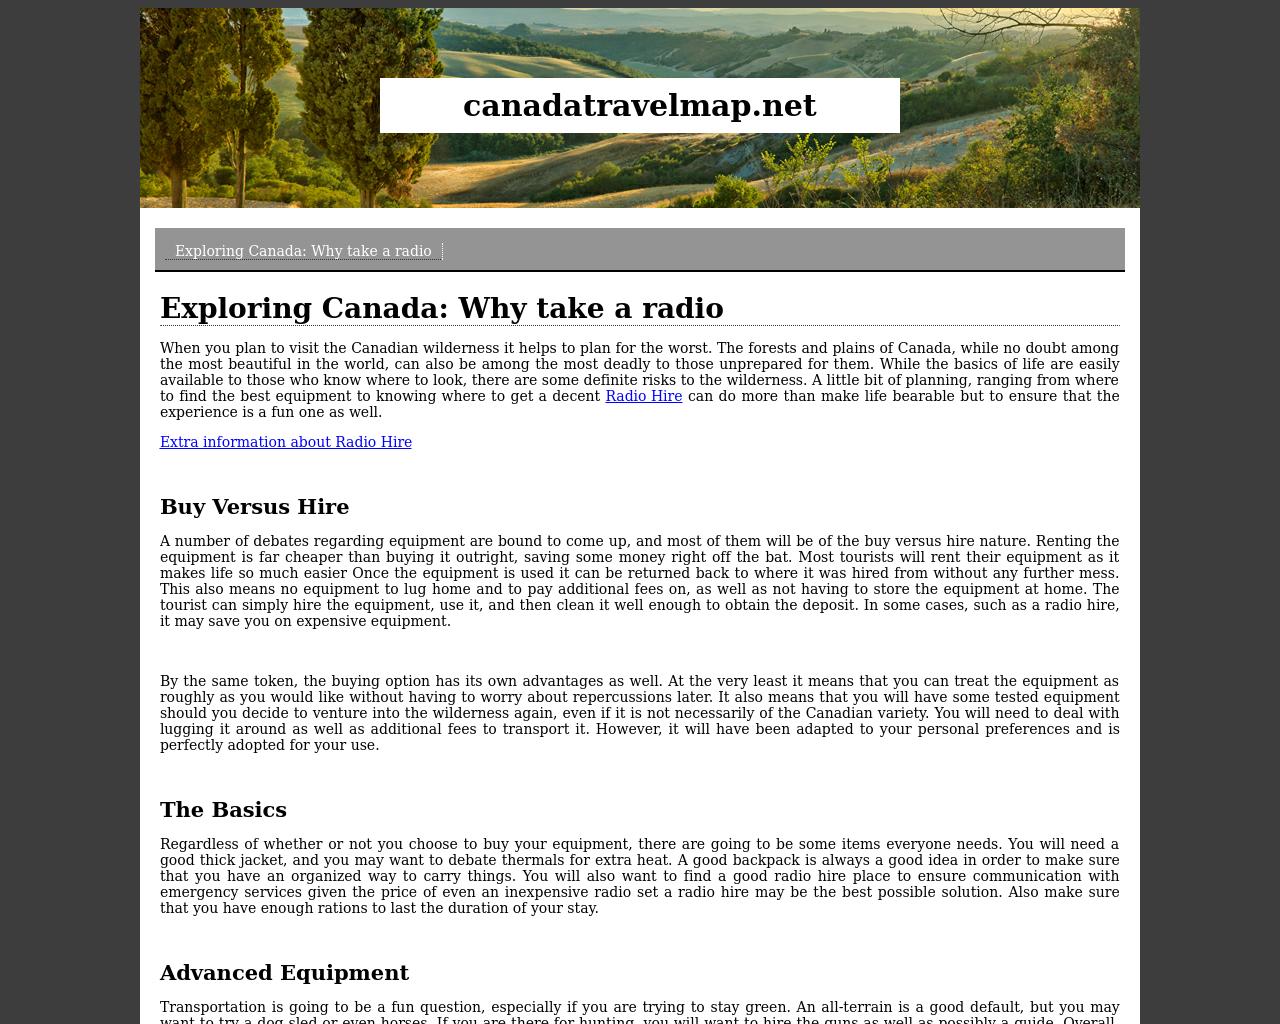 Canada-Vacation-Advertising-Reviews-Pricing